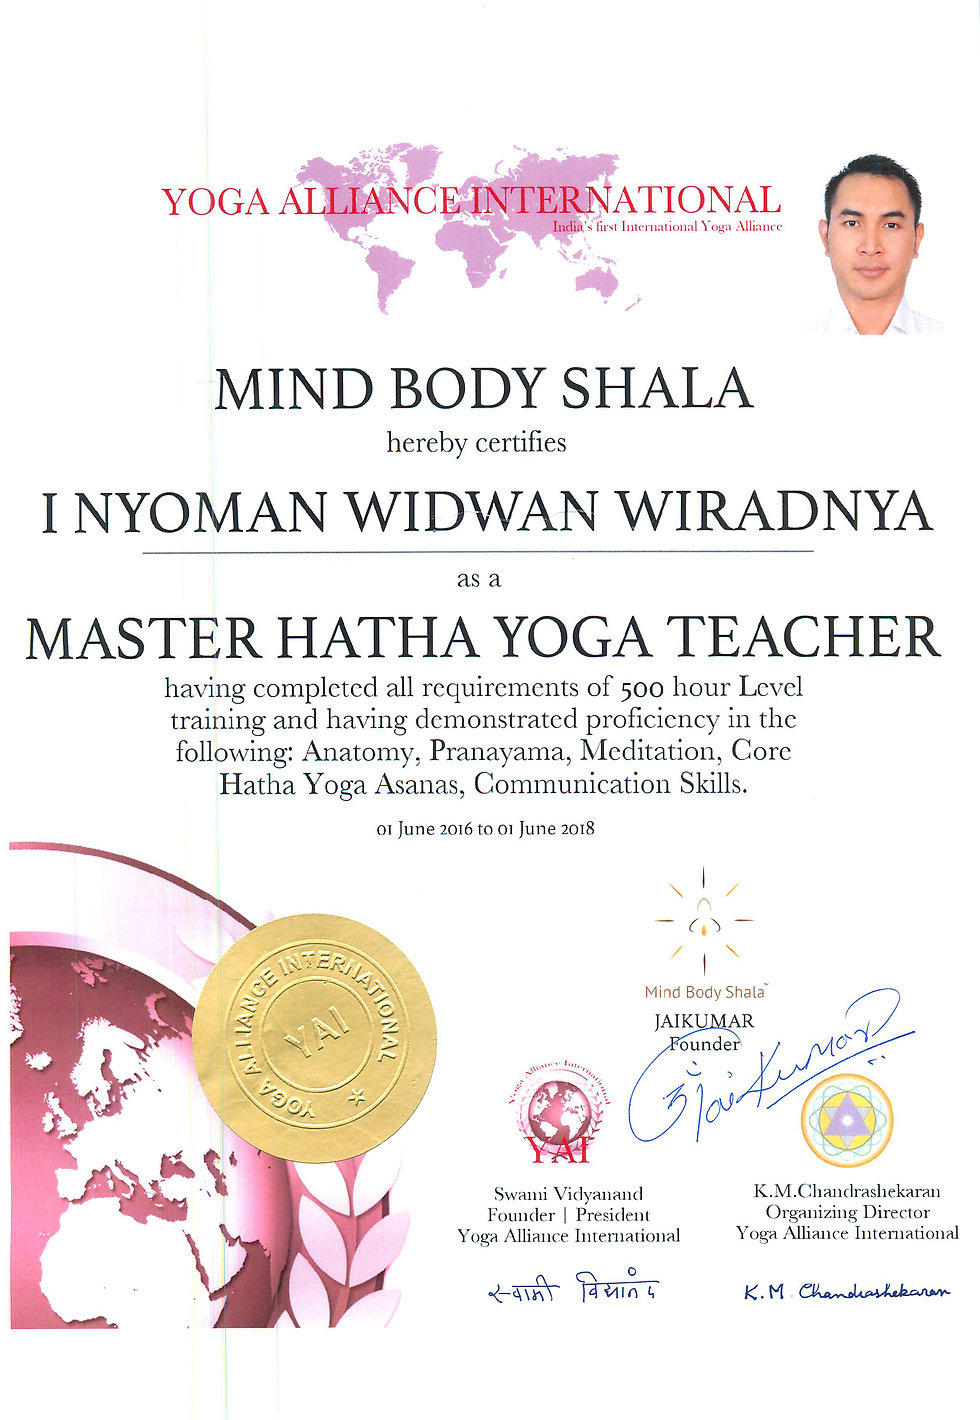 widwan yoga zertifikat 1.jpg